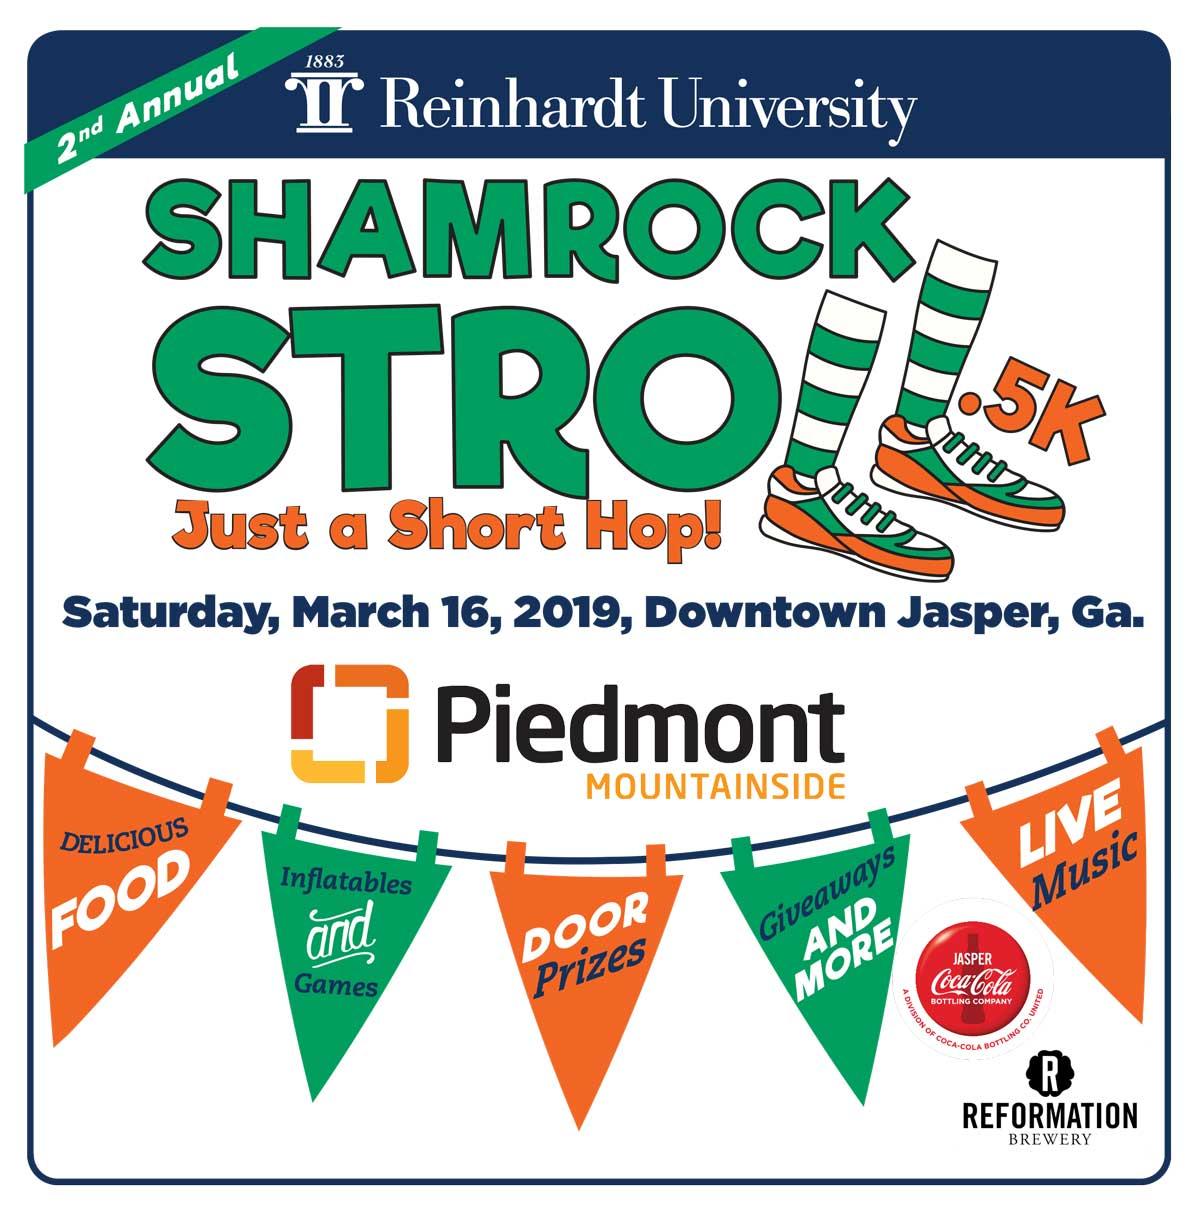 shamrock_stroll_banner-web